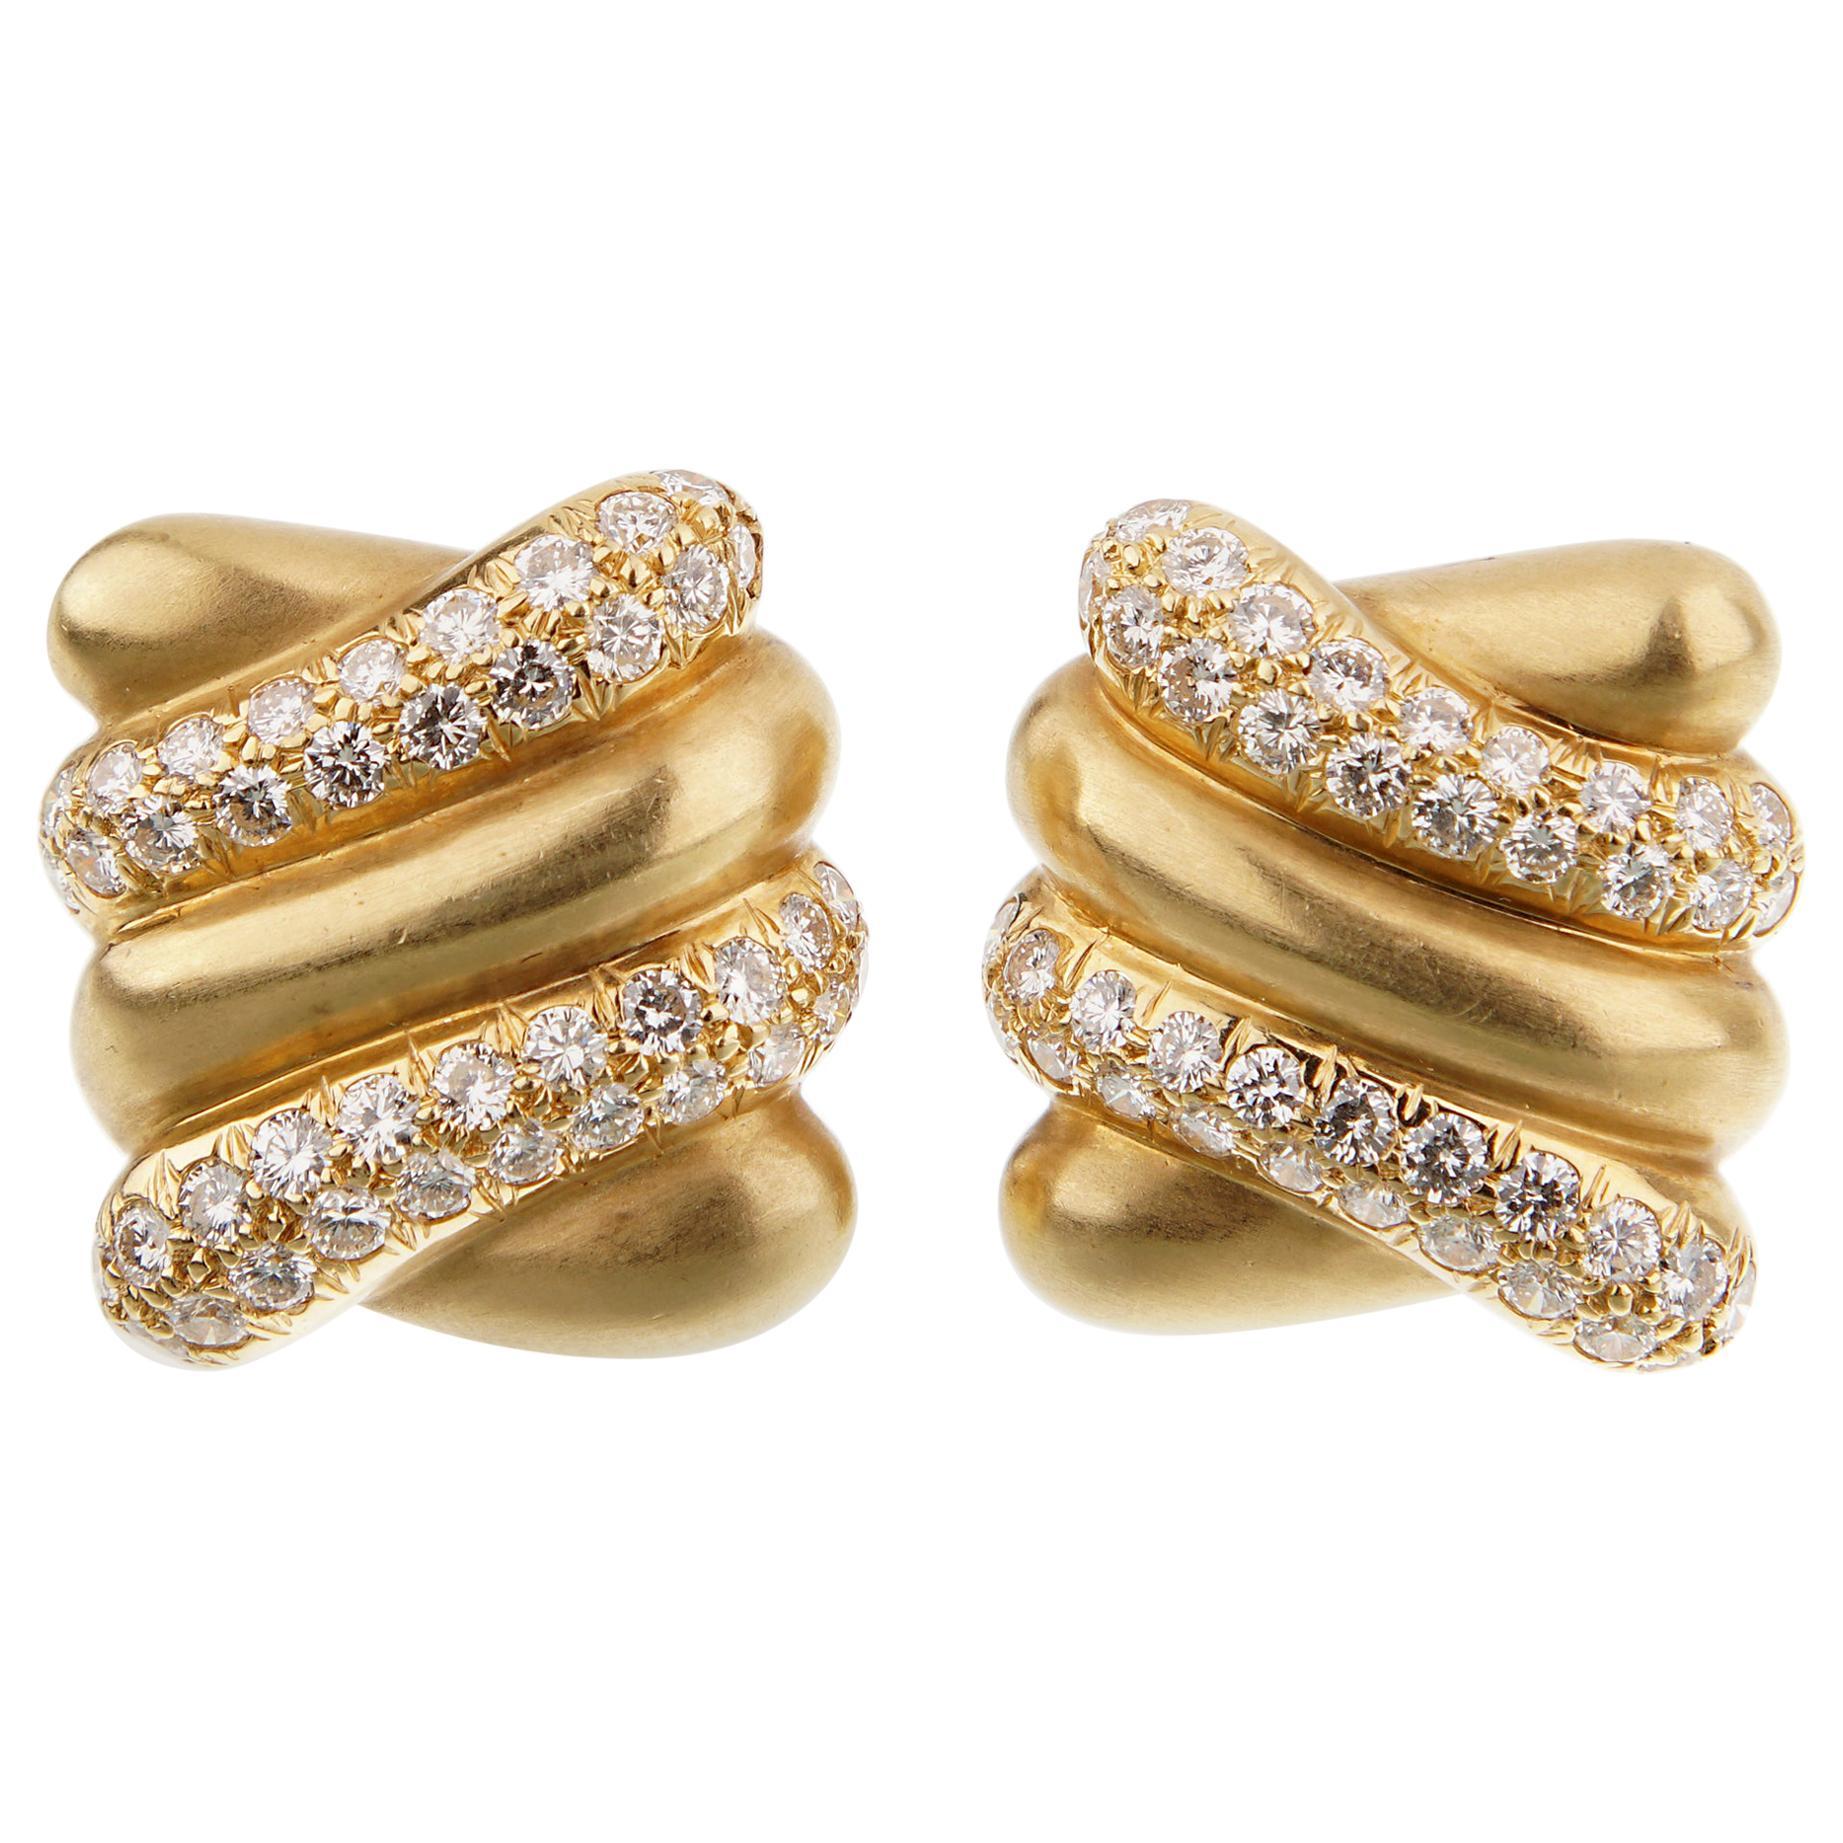 Angela Cummings Yellow Gold Diamond Vintage Earrings